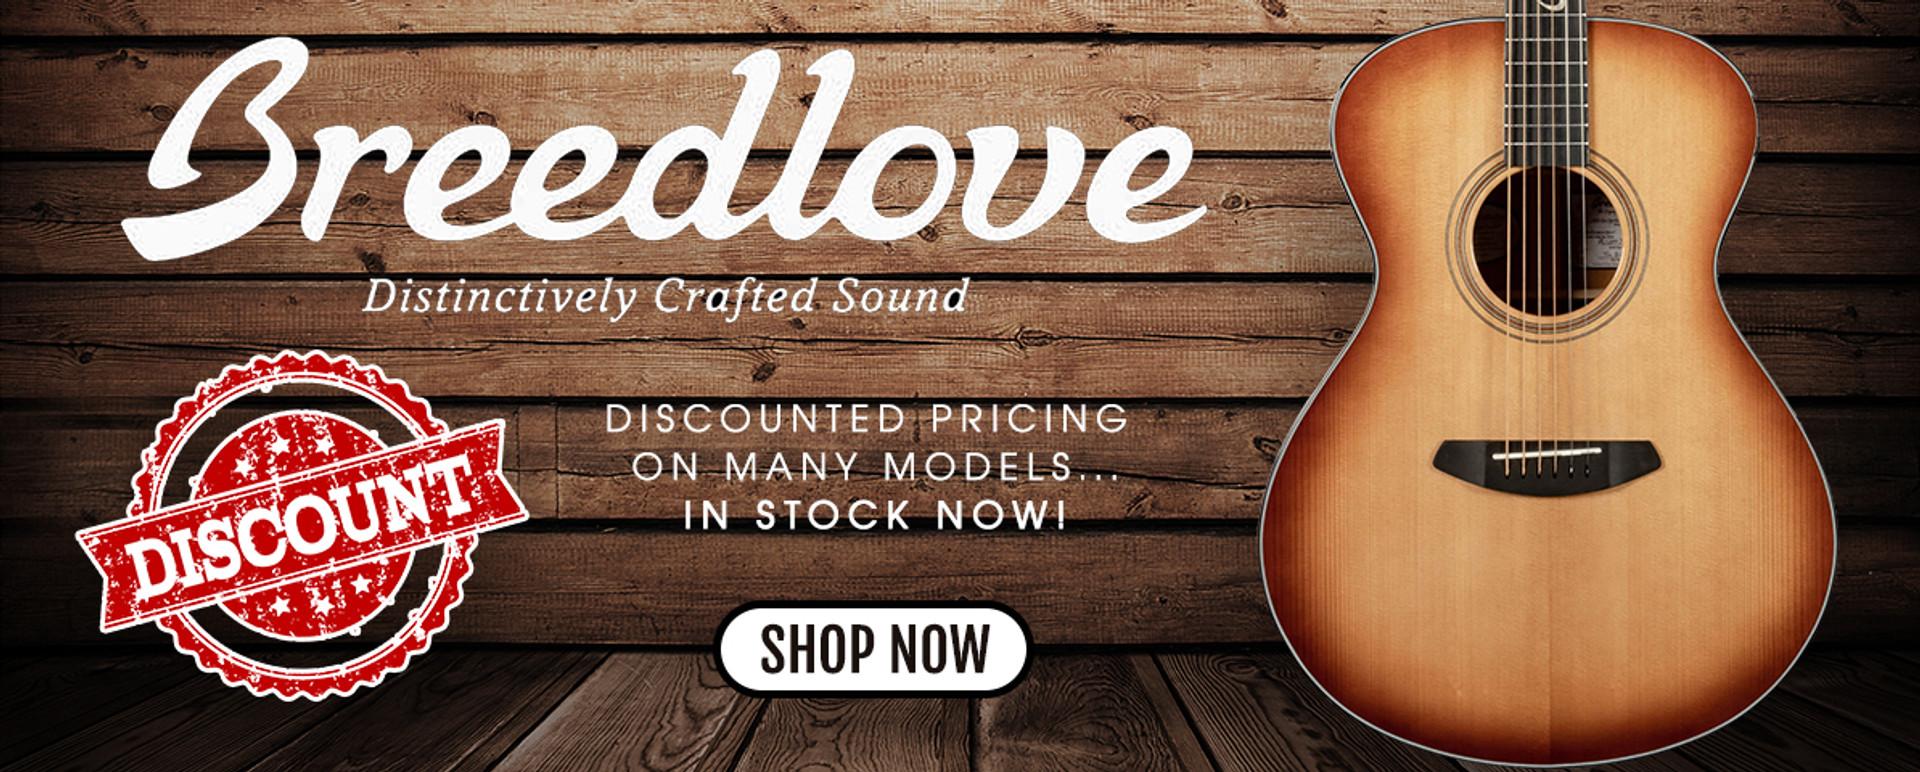 DISCOUNTED BREEDLOVE GUITARS